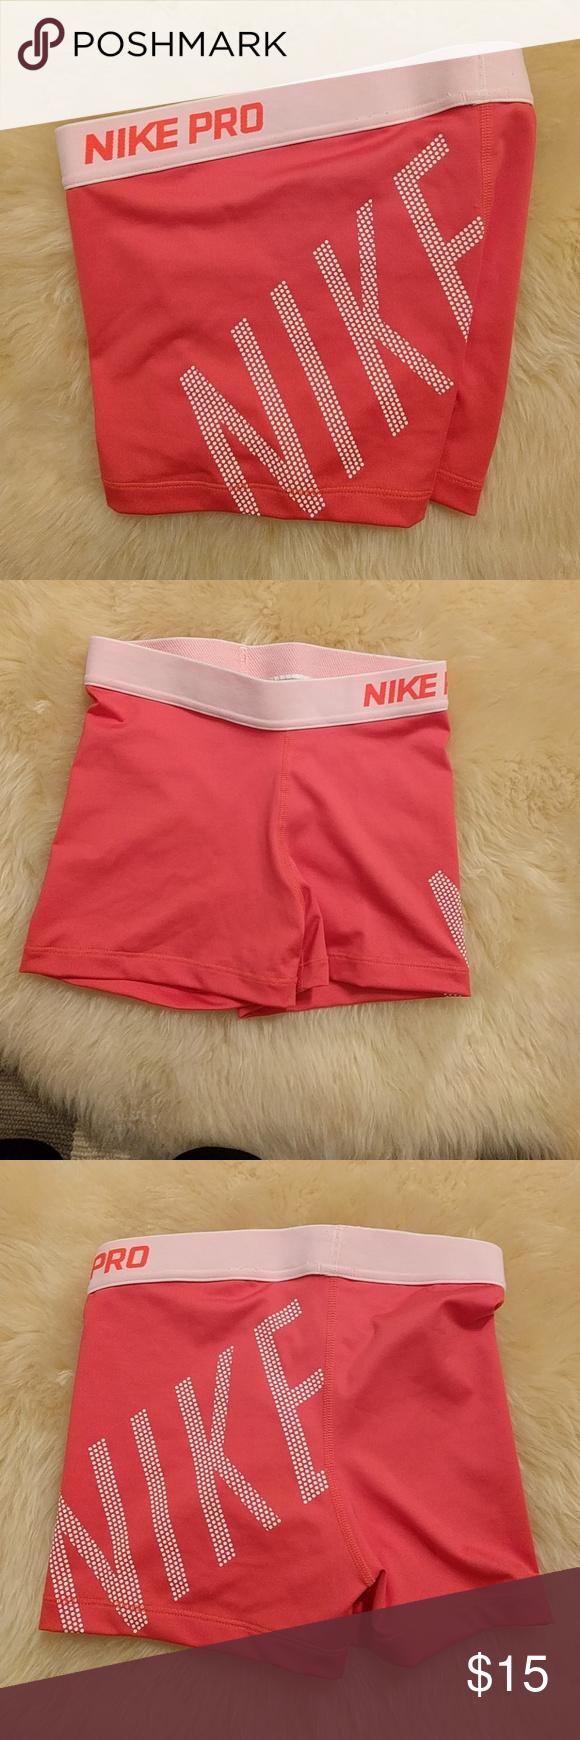 Nike pro pink logo shorts Logo shorts, Nike pros, Pink logo